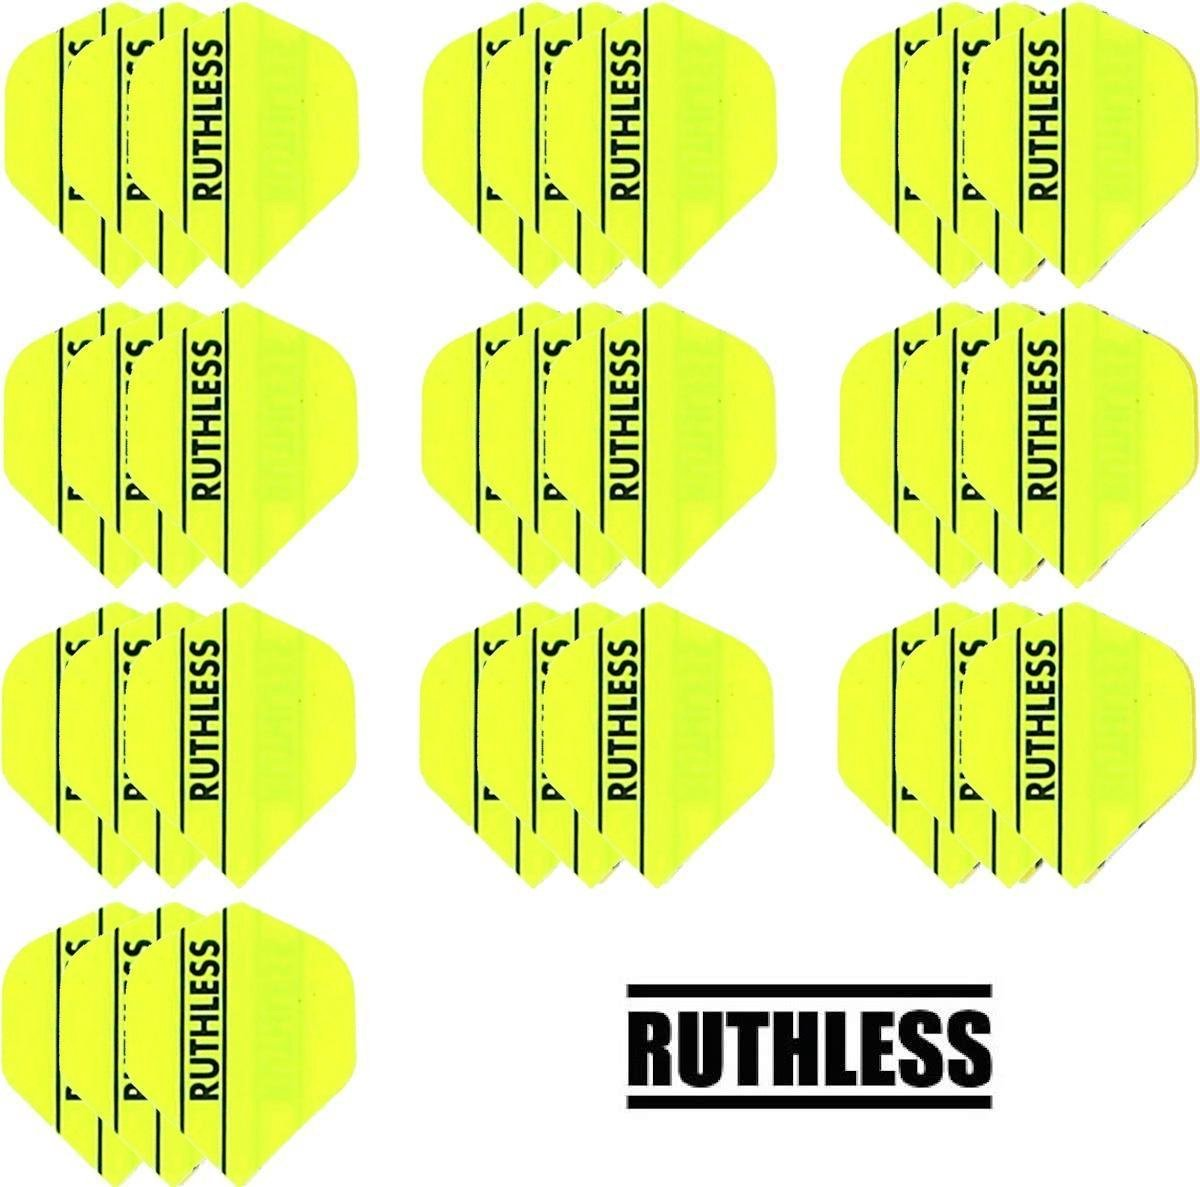 10 sets (30 stuks) Ruthless Flights Multipack Fluro Yellow